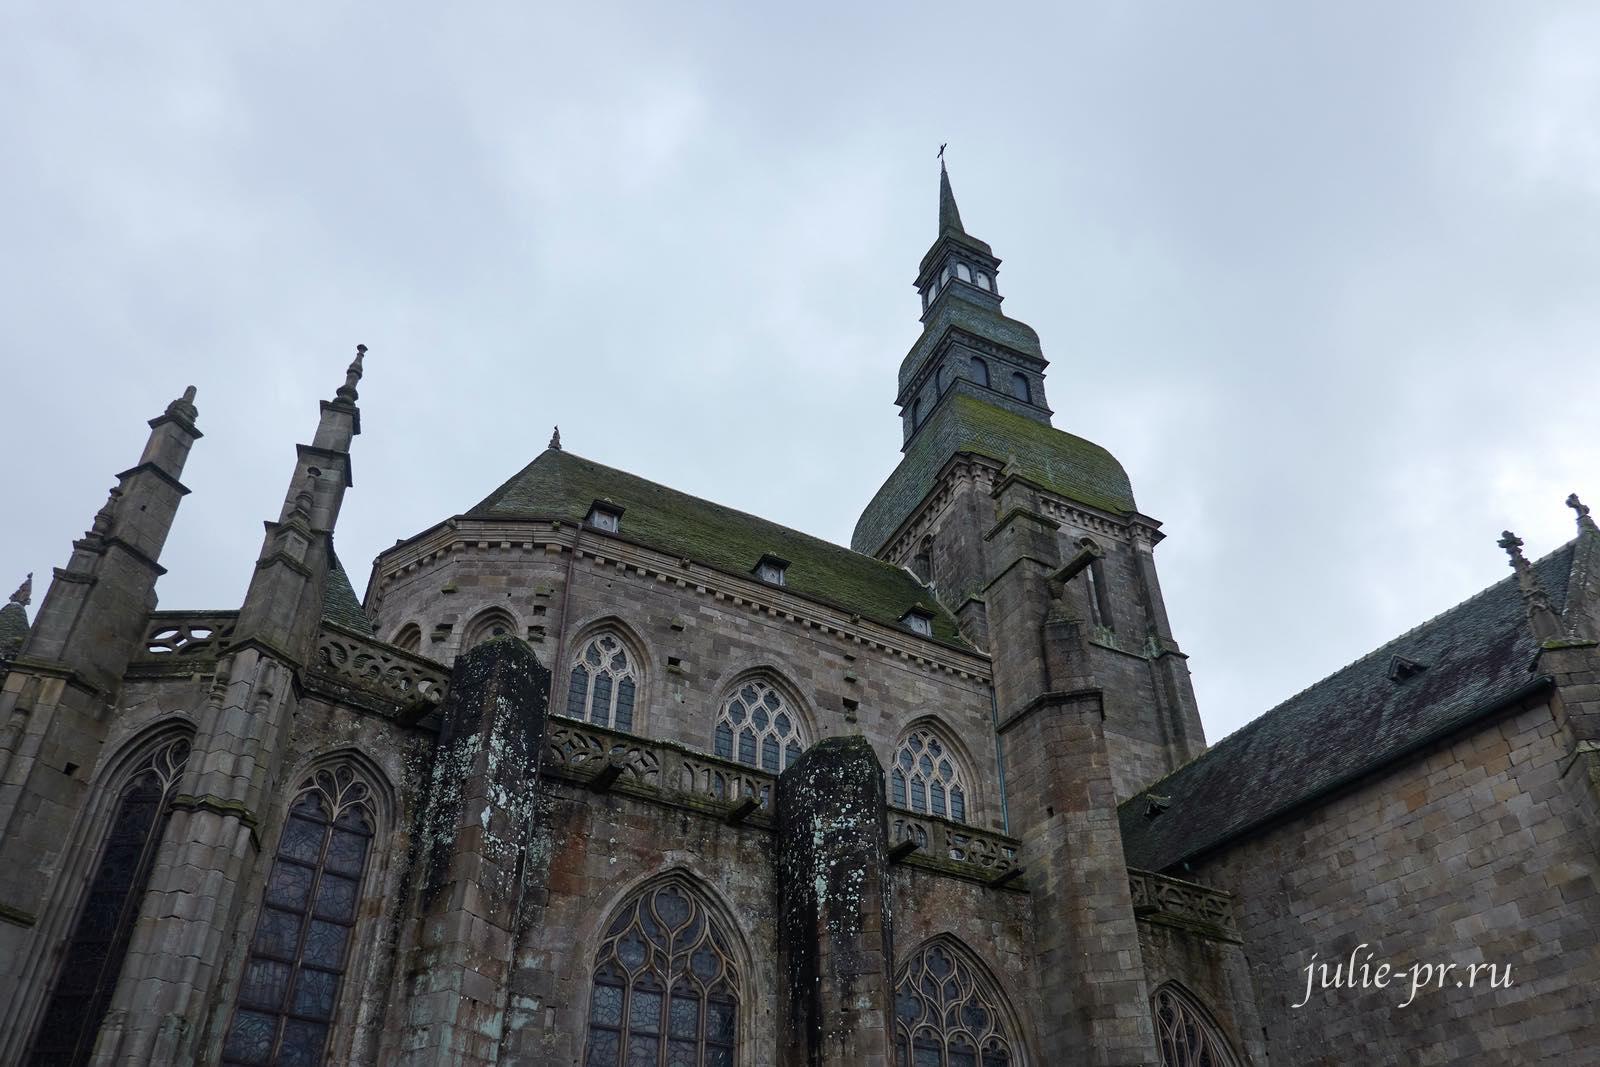 Базилика Святого Спасителя, Динан, Франция, Бретань